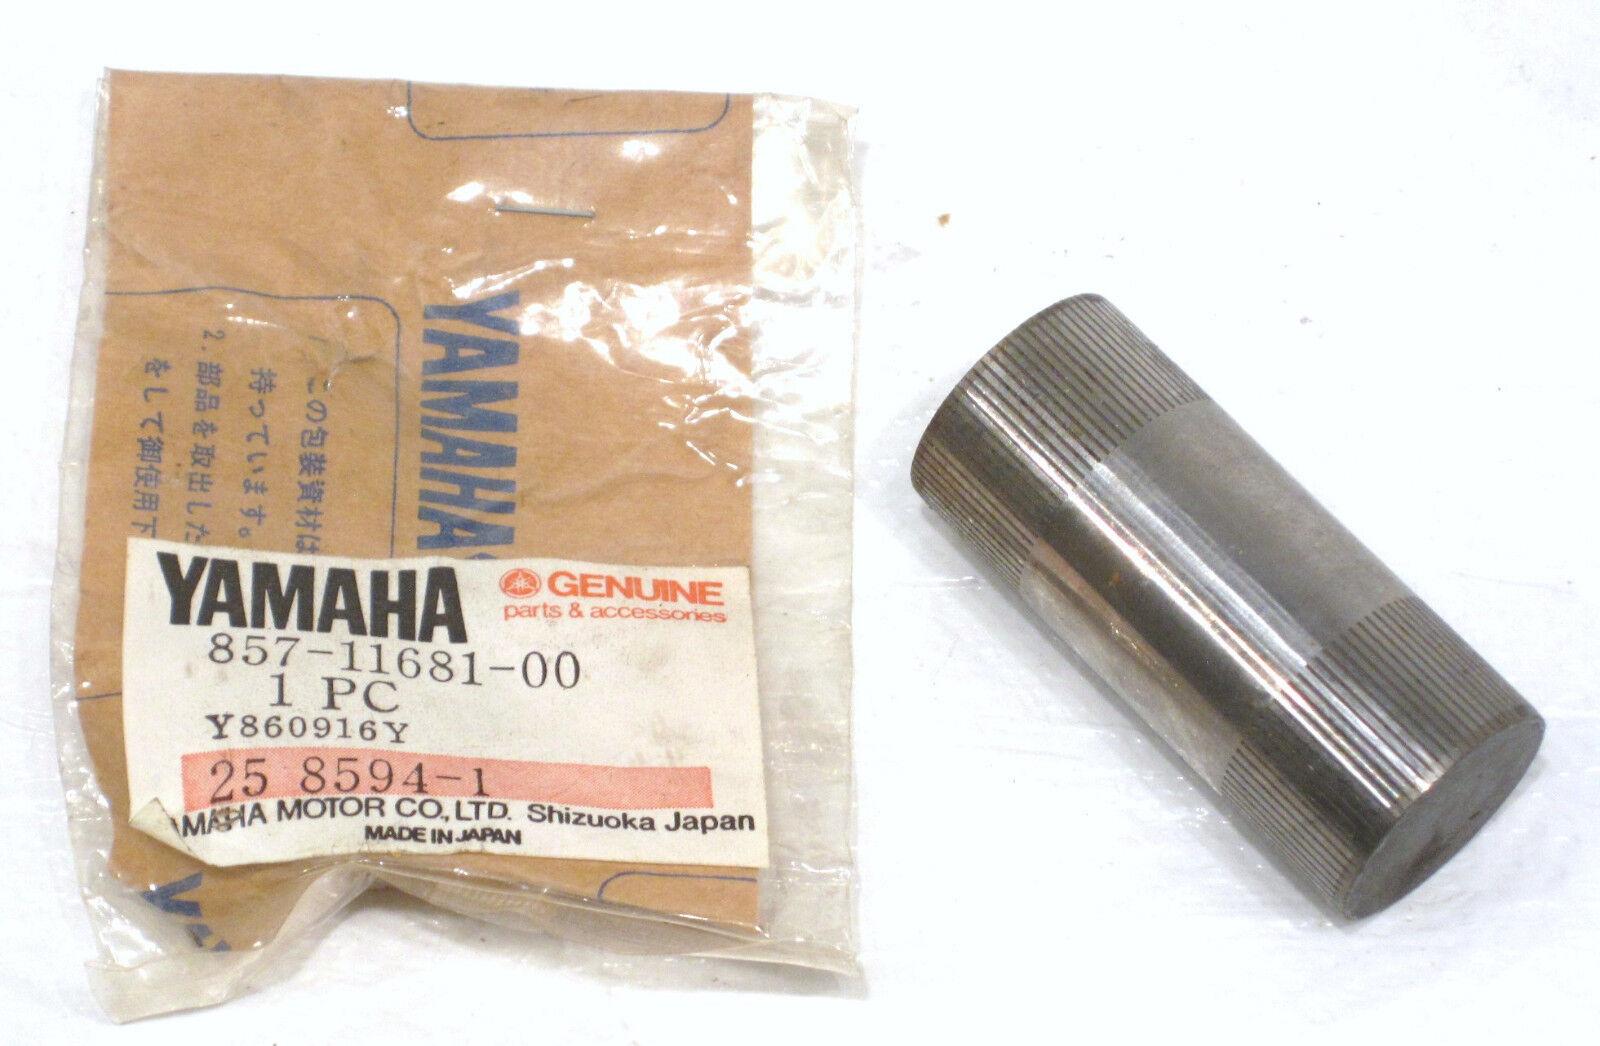 1984-2001 Genuine Yamaha Phazer Snowmobile Crankshaft Pin 857-11681-00 NOS